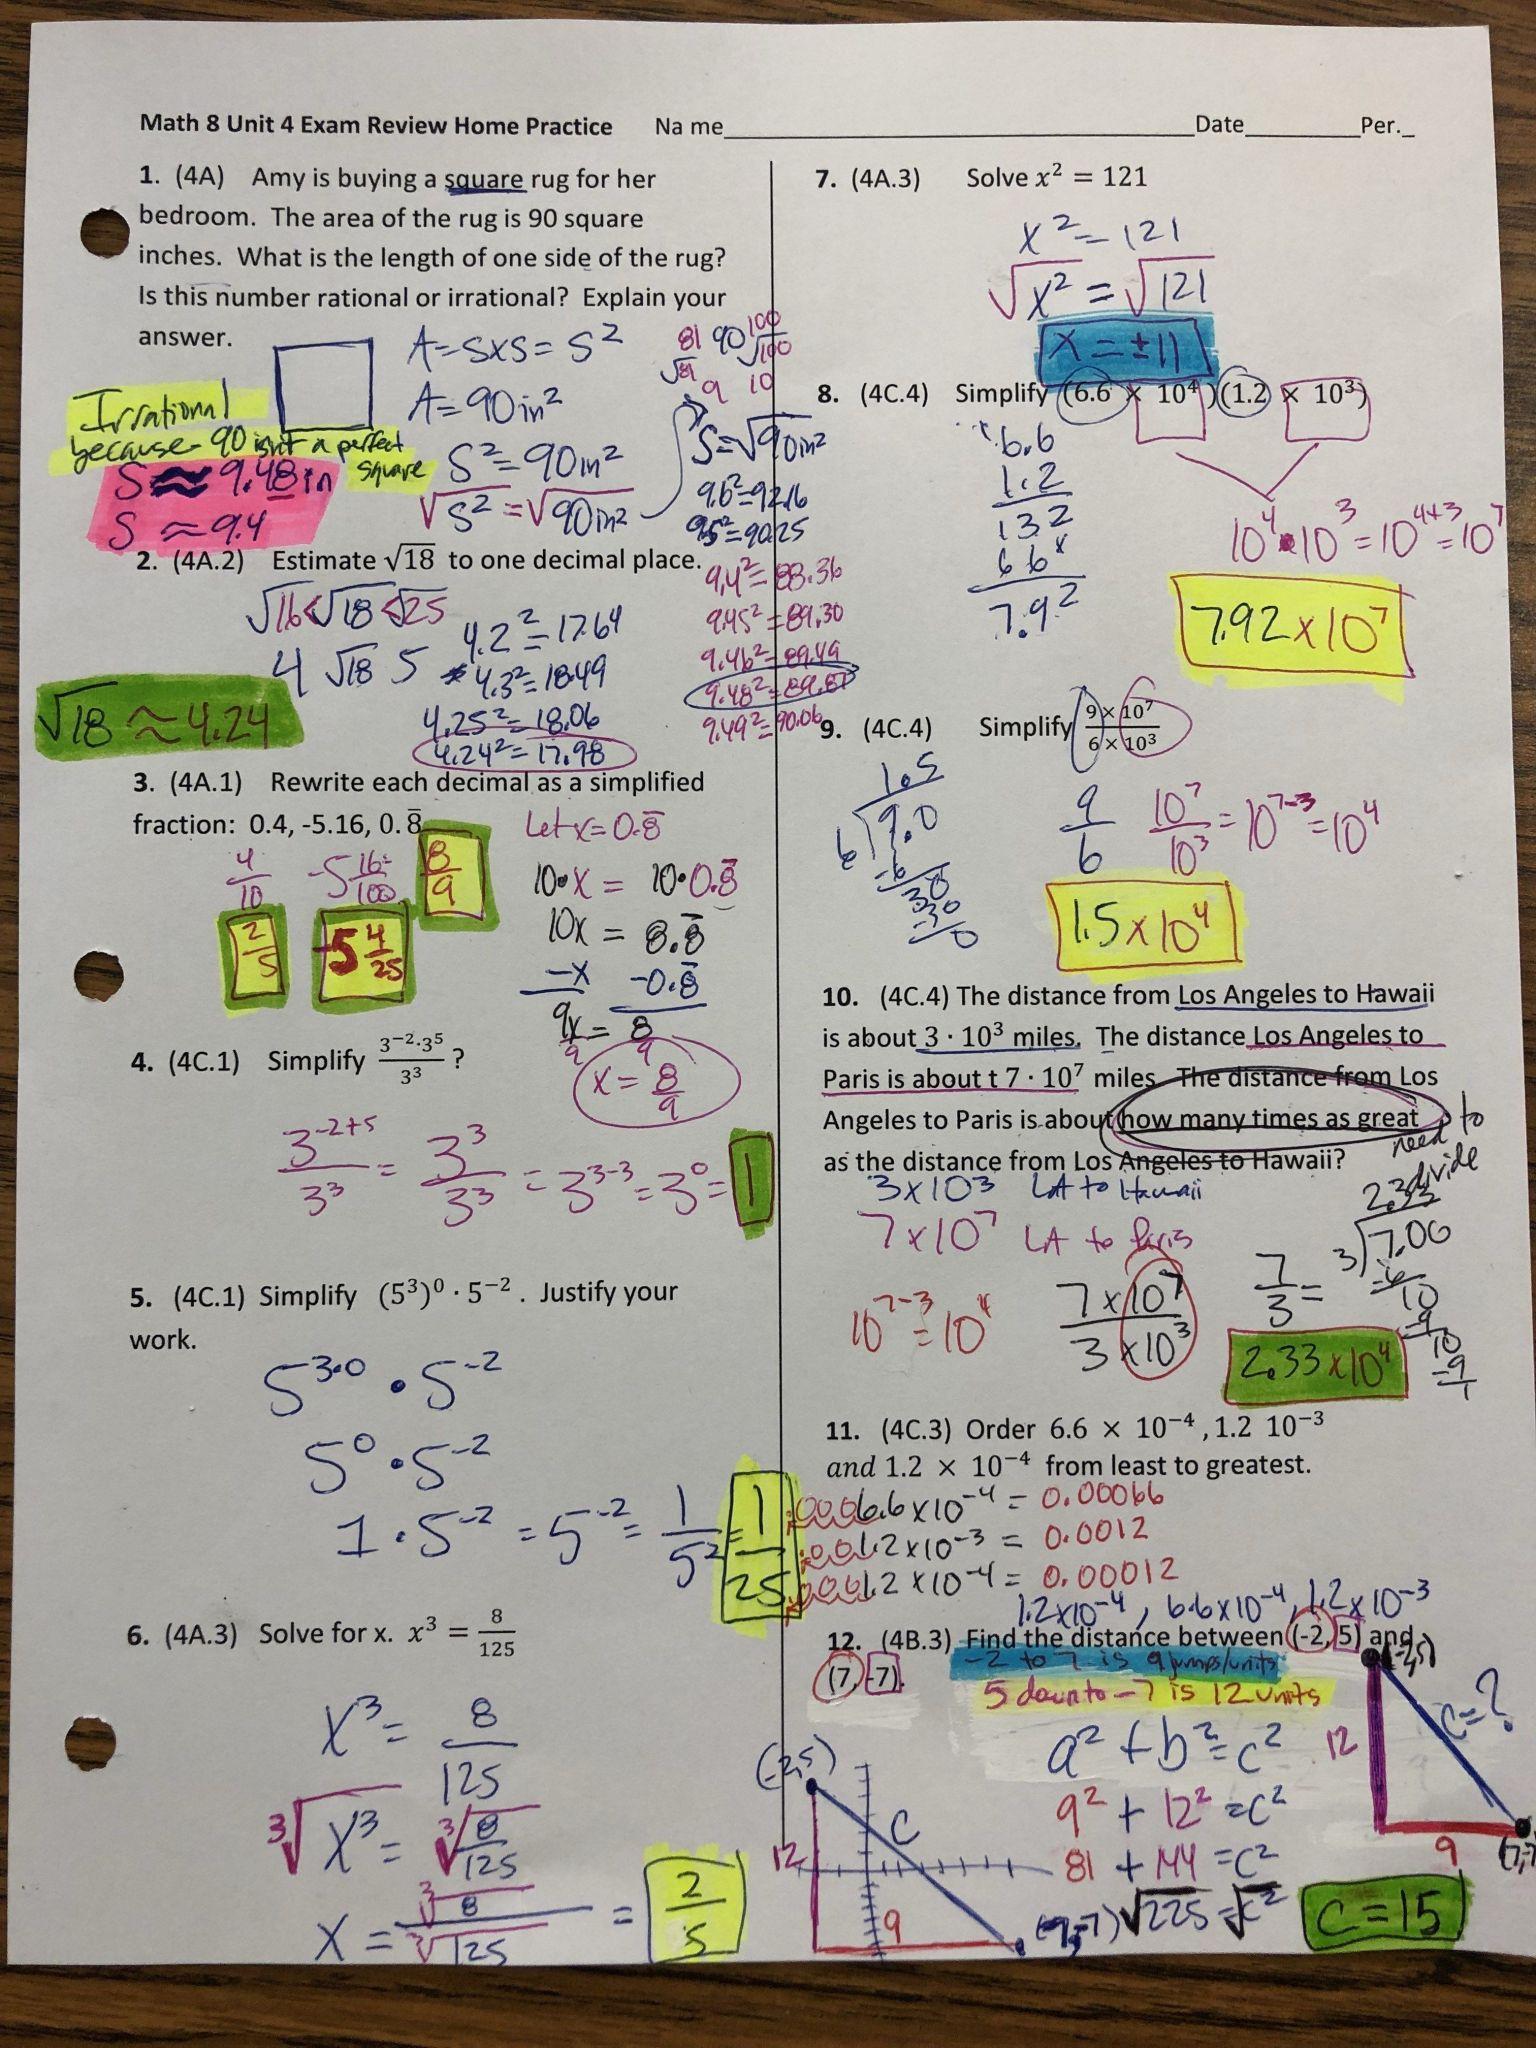 Algebra 2 Exponent Practice Worksheet Answers